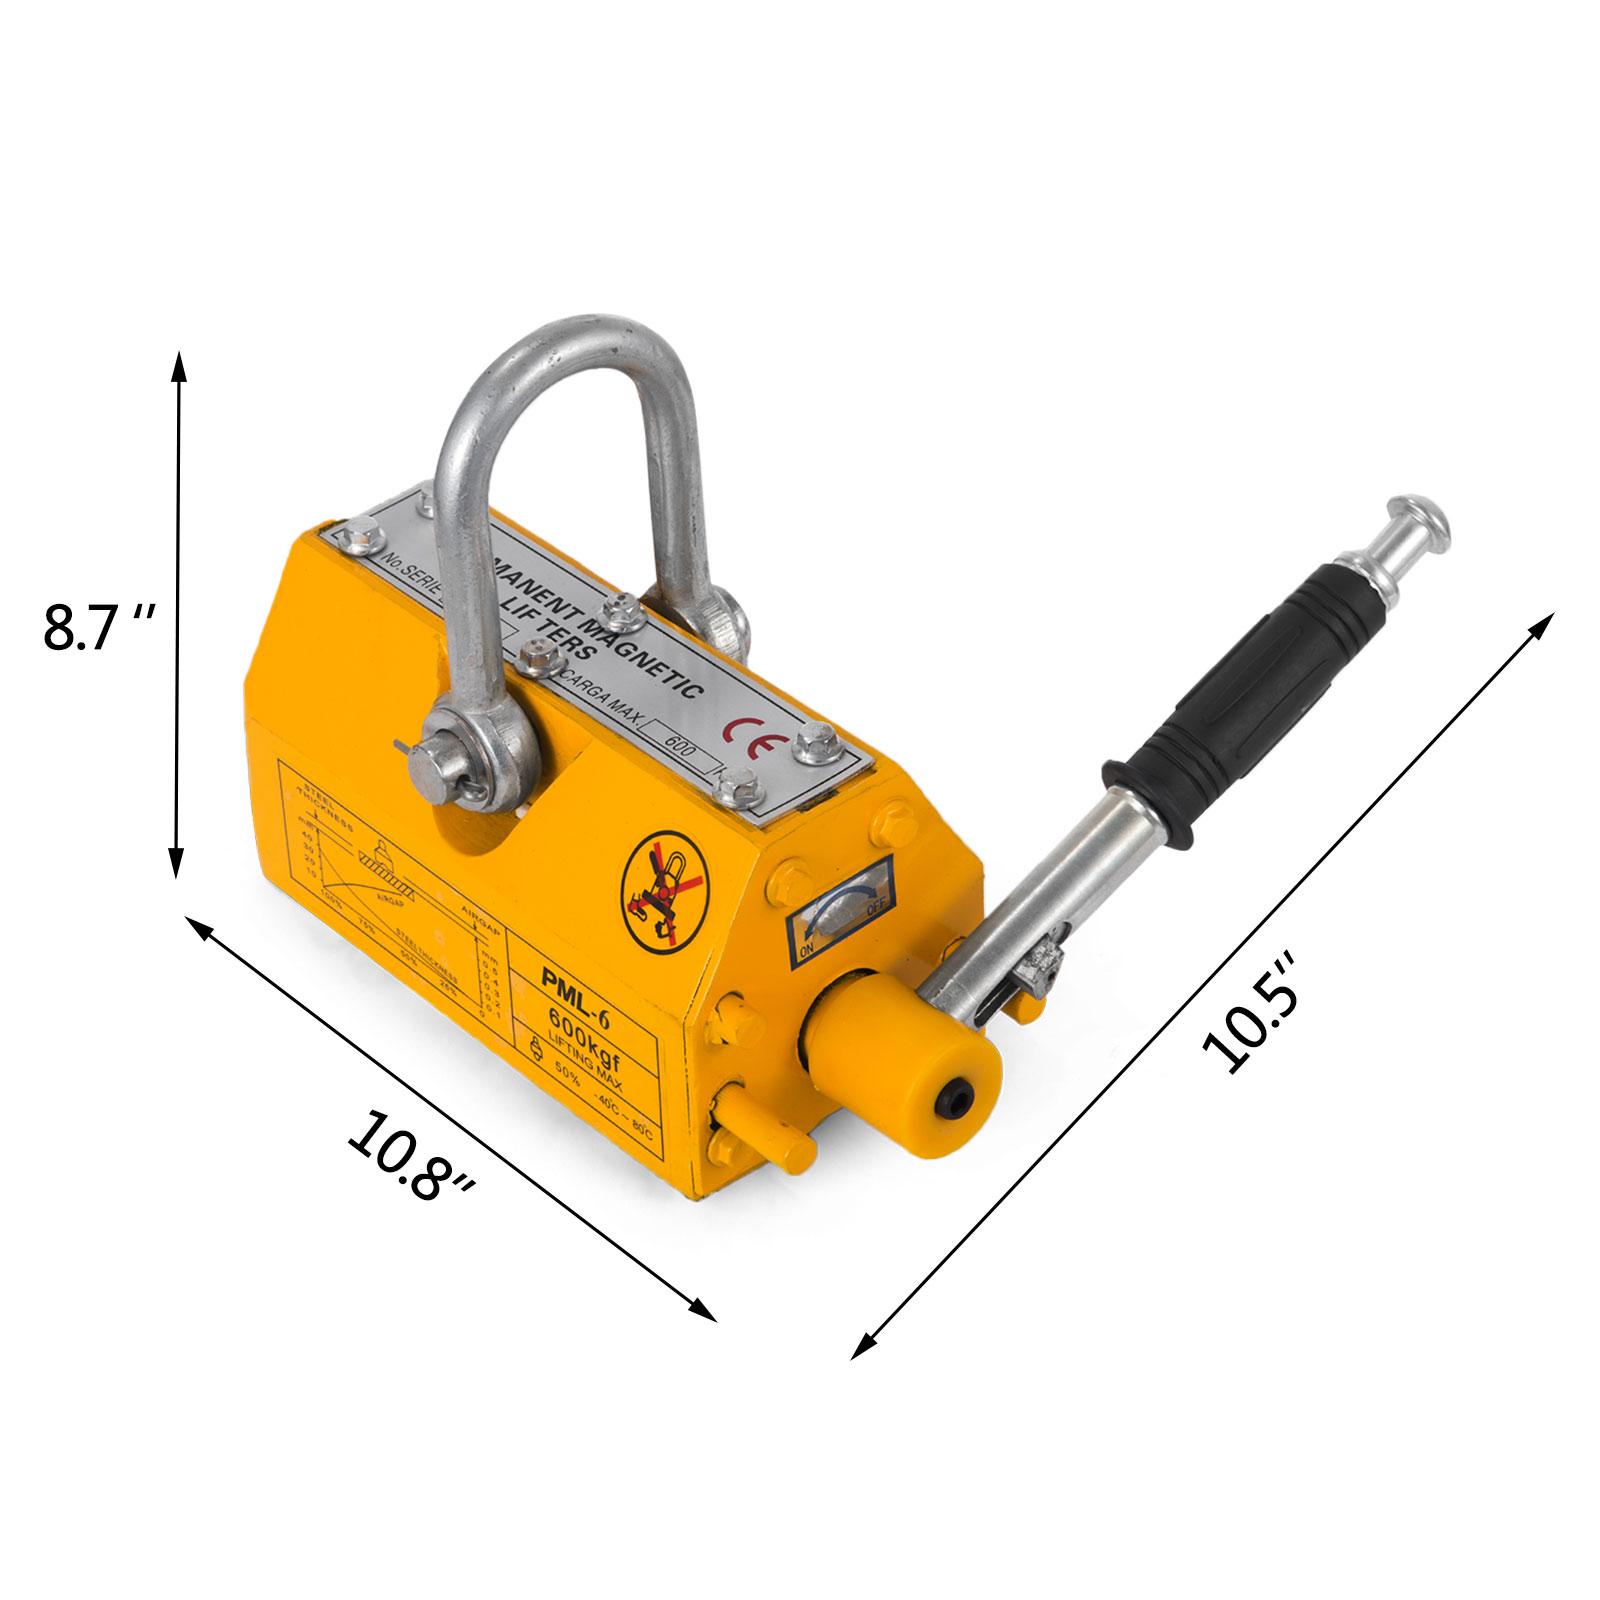 100-300-600-1000KG-Steel-Magnetic-Lifter-Heavy-Duty-Crane-Hoist-Lifting-Magnet miniature 50